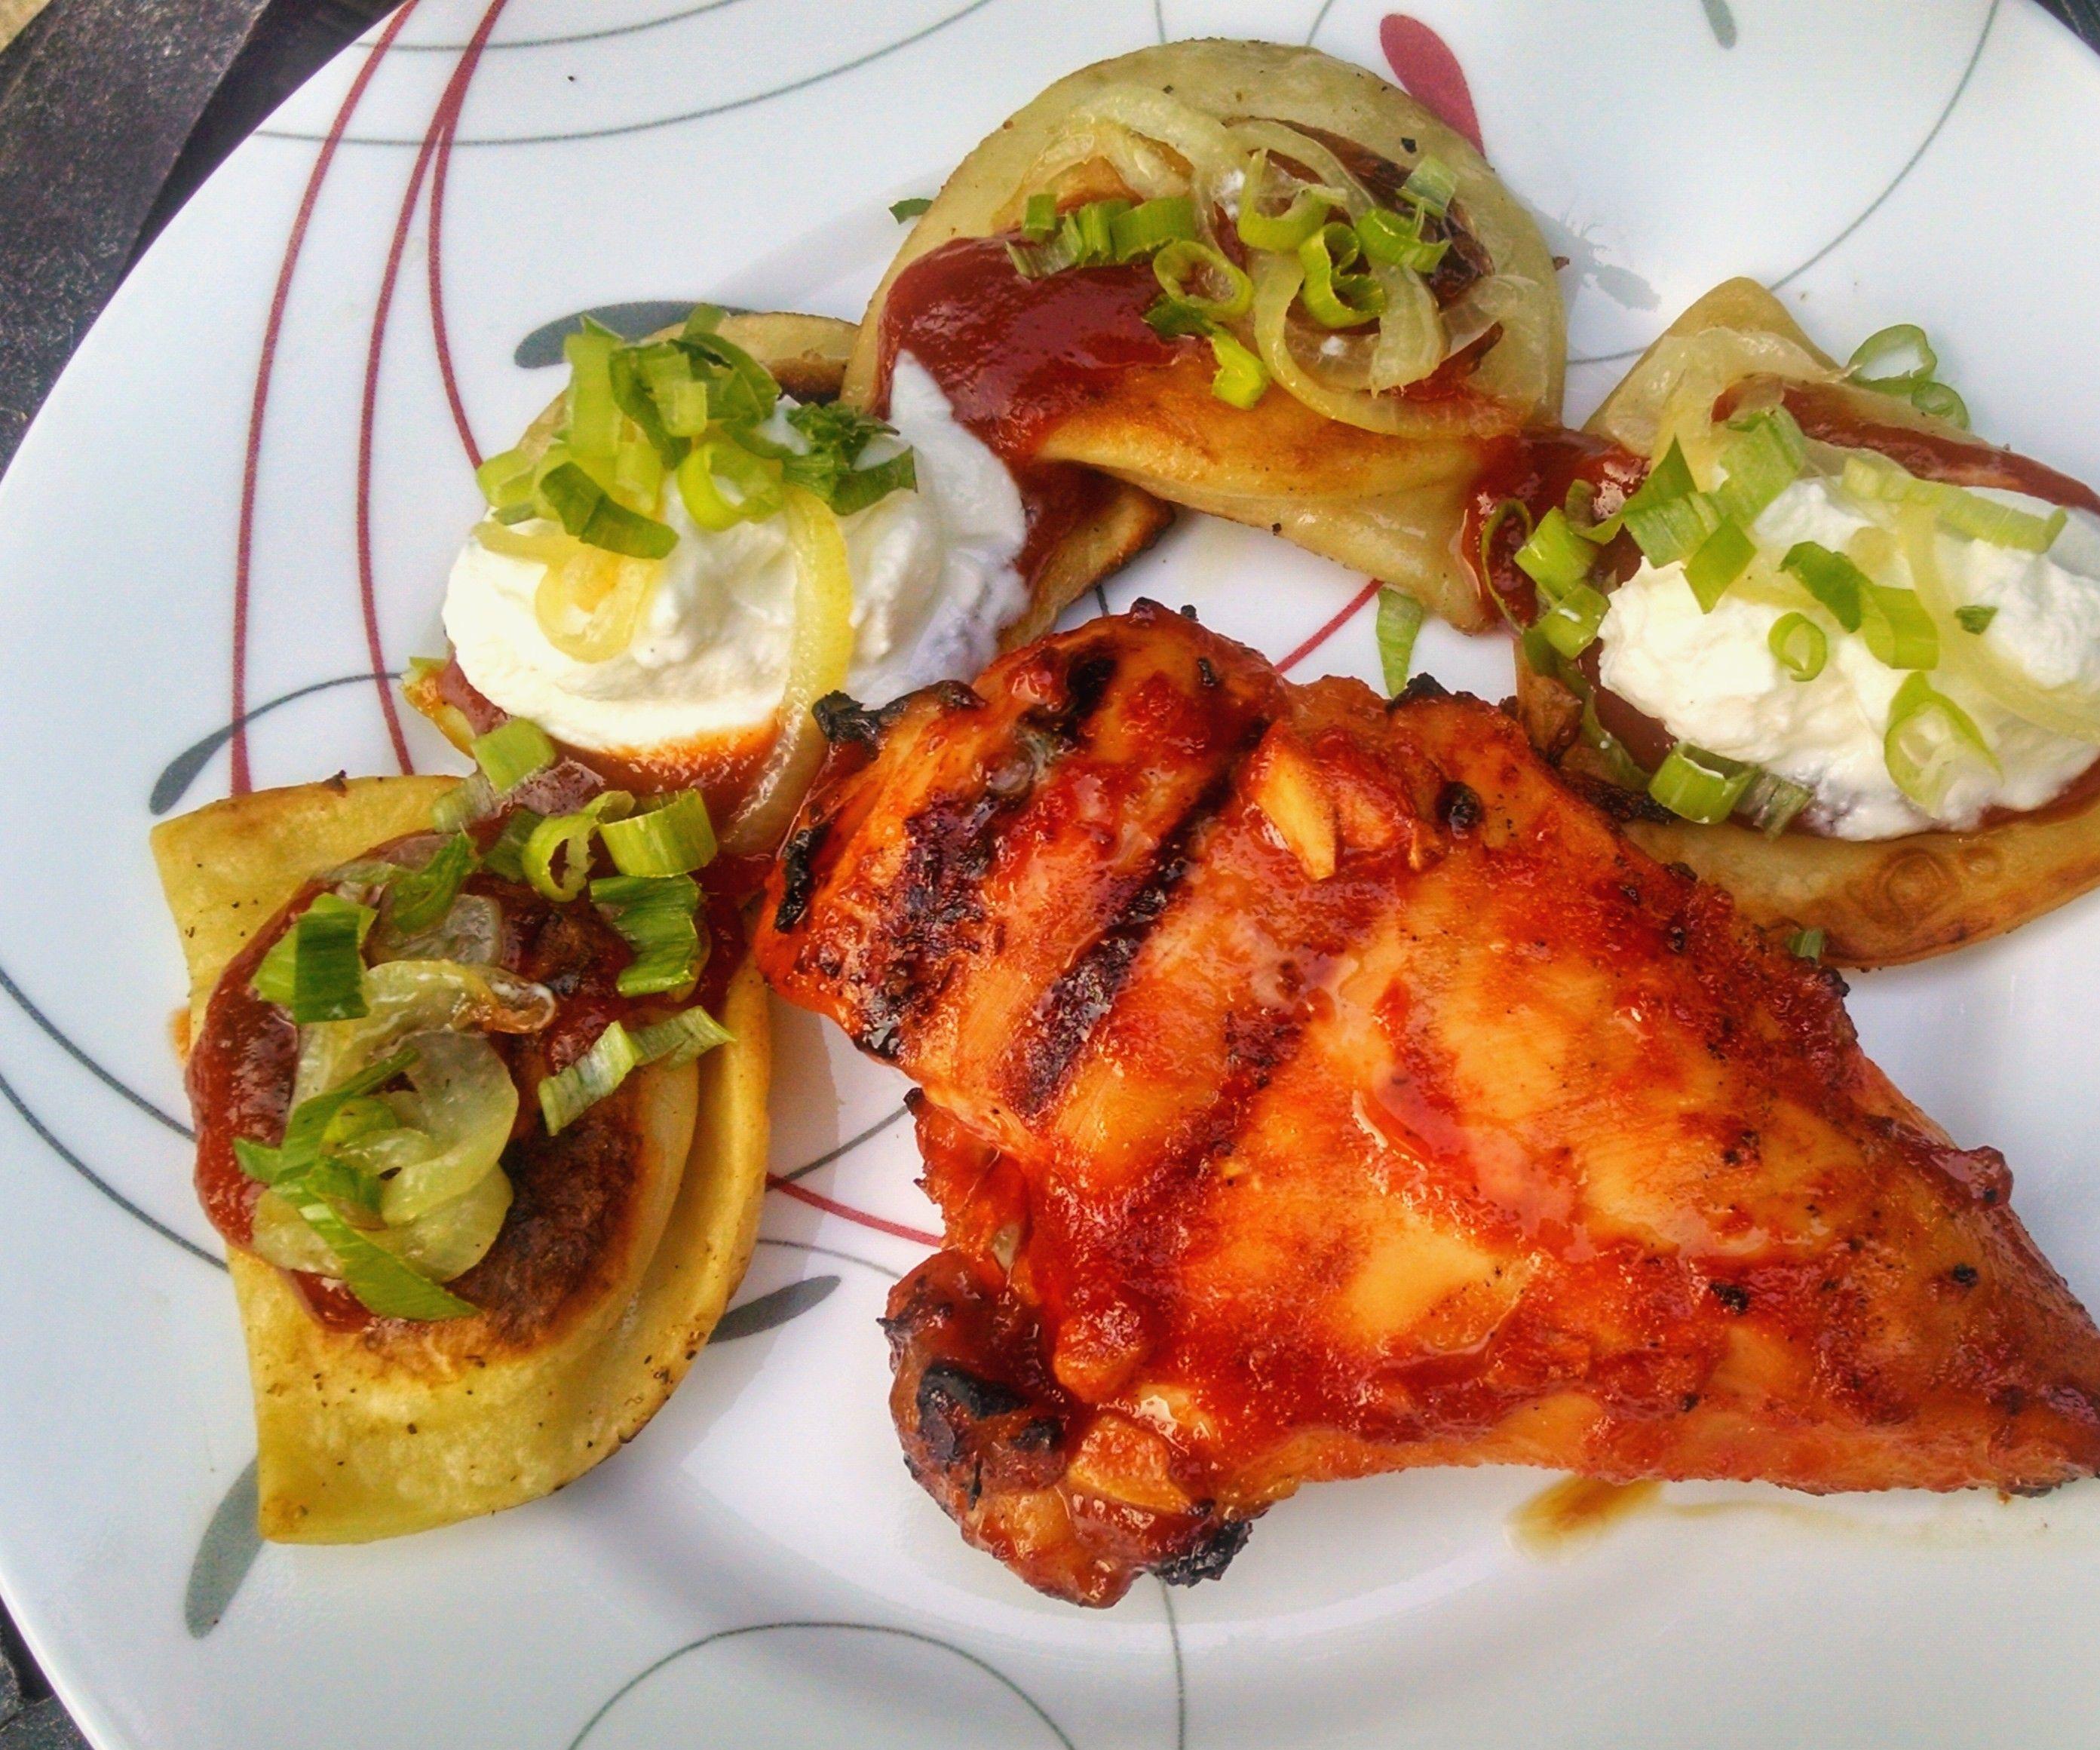 Messy's Grilled BBQ Chicken